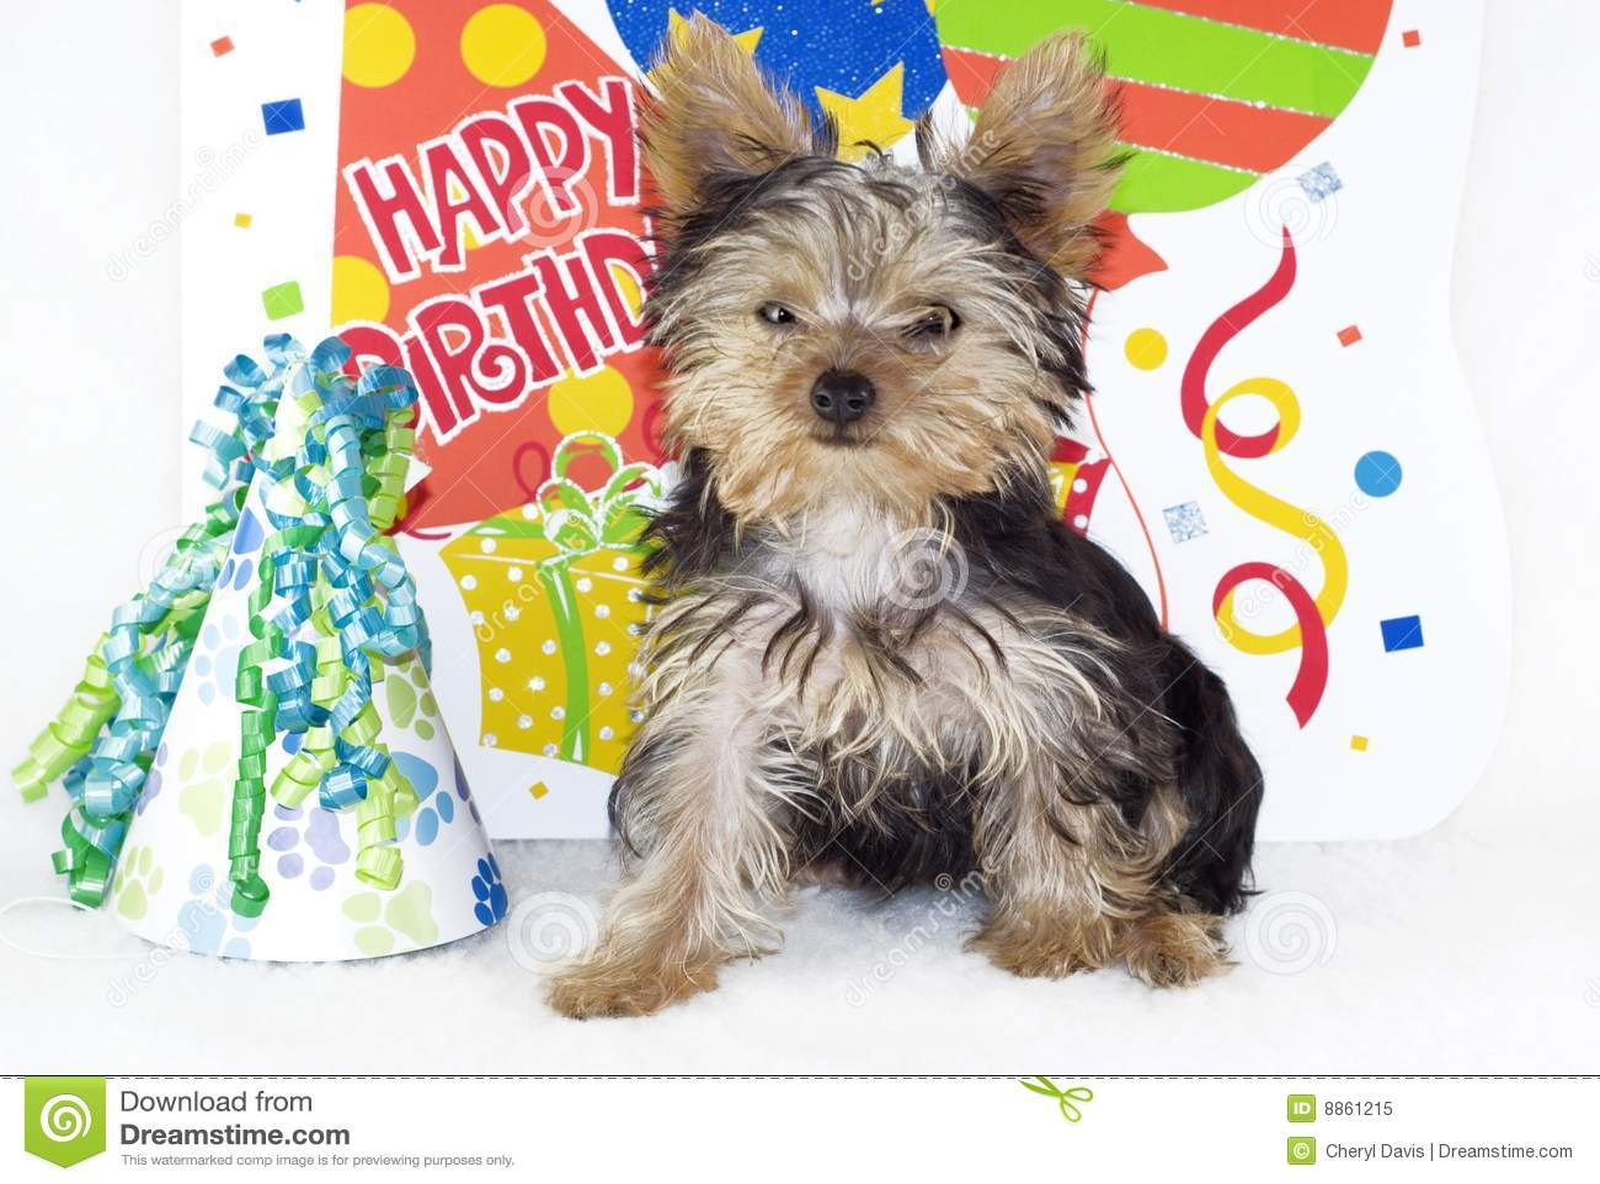 carte anniversaire chien yorkshire